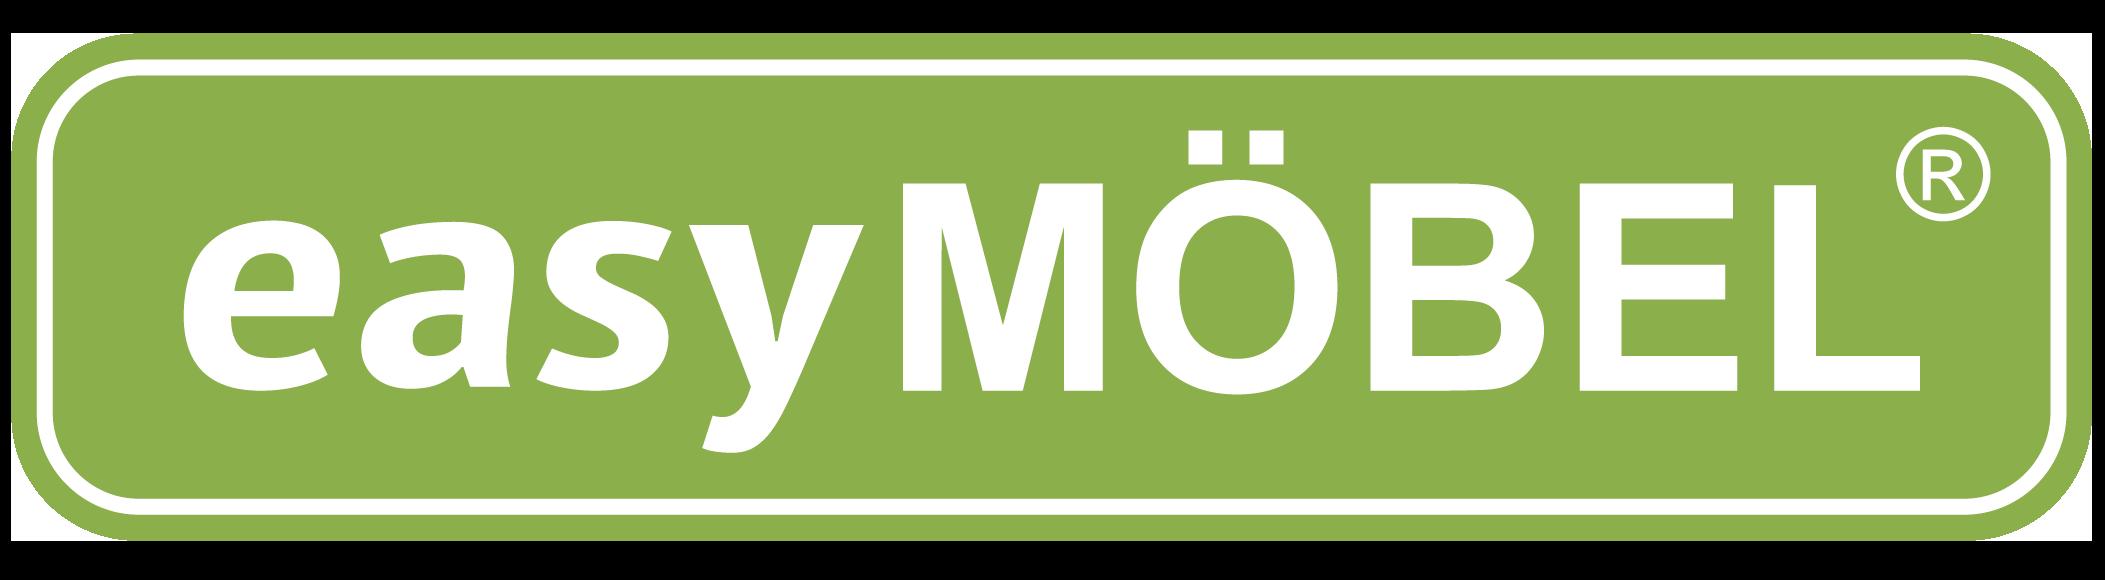 kinderbett jugendbett kiefer vollholz massiv nussfarben. Black Bedroom Furniture Sets. Home Design Ideas